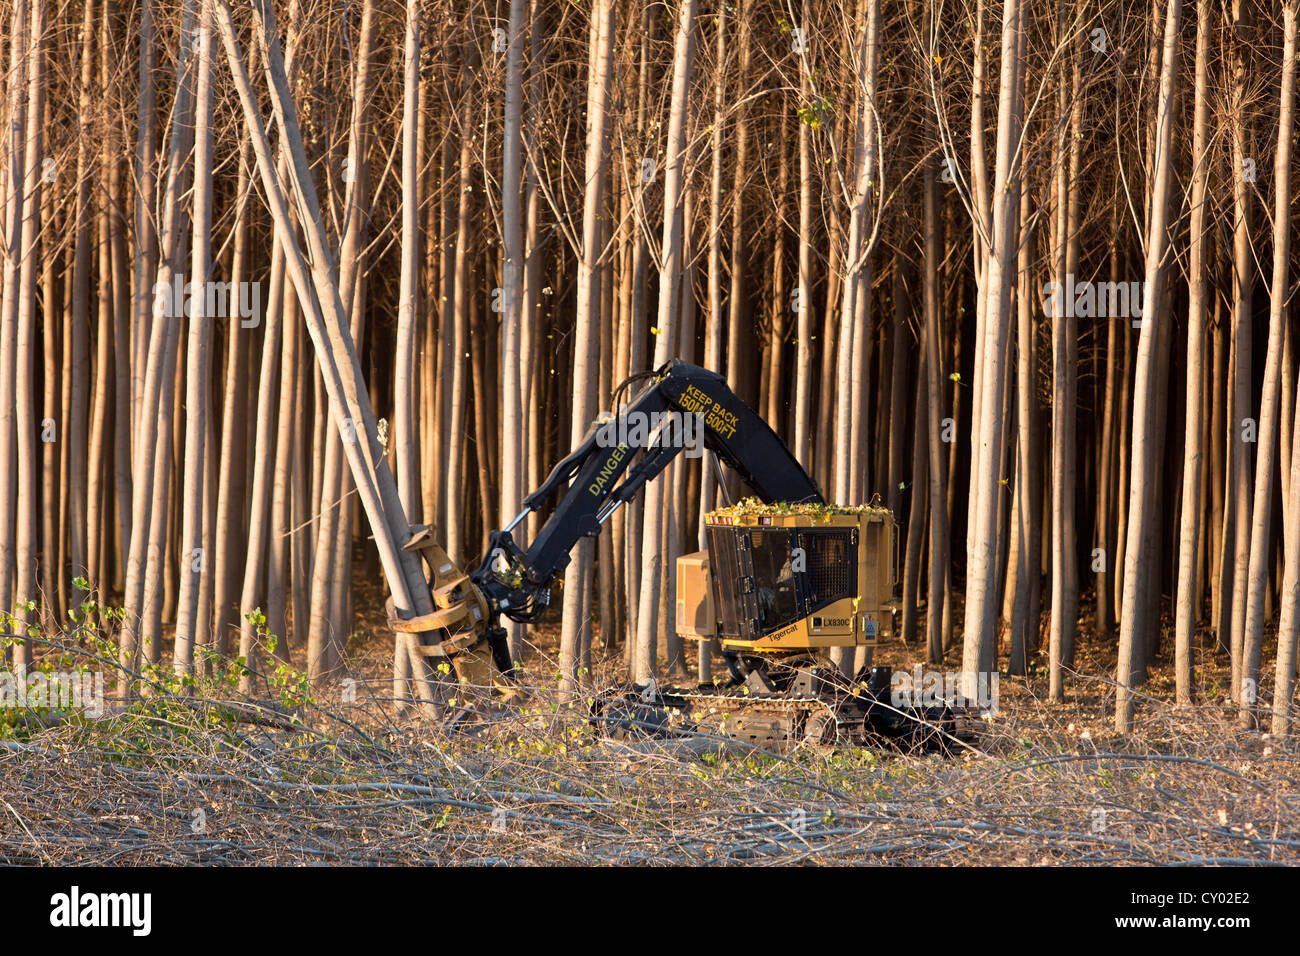 Tigercat Feller Buncher harvesting Hybrid Poplar trees. - Stock Image